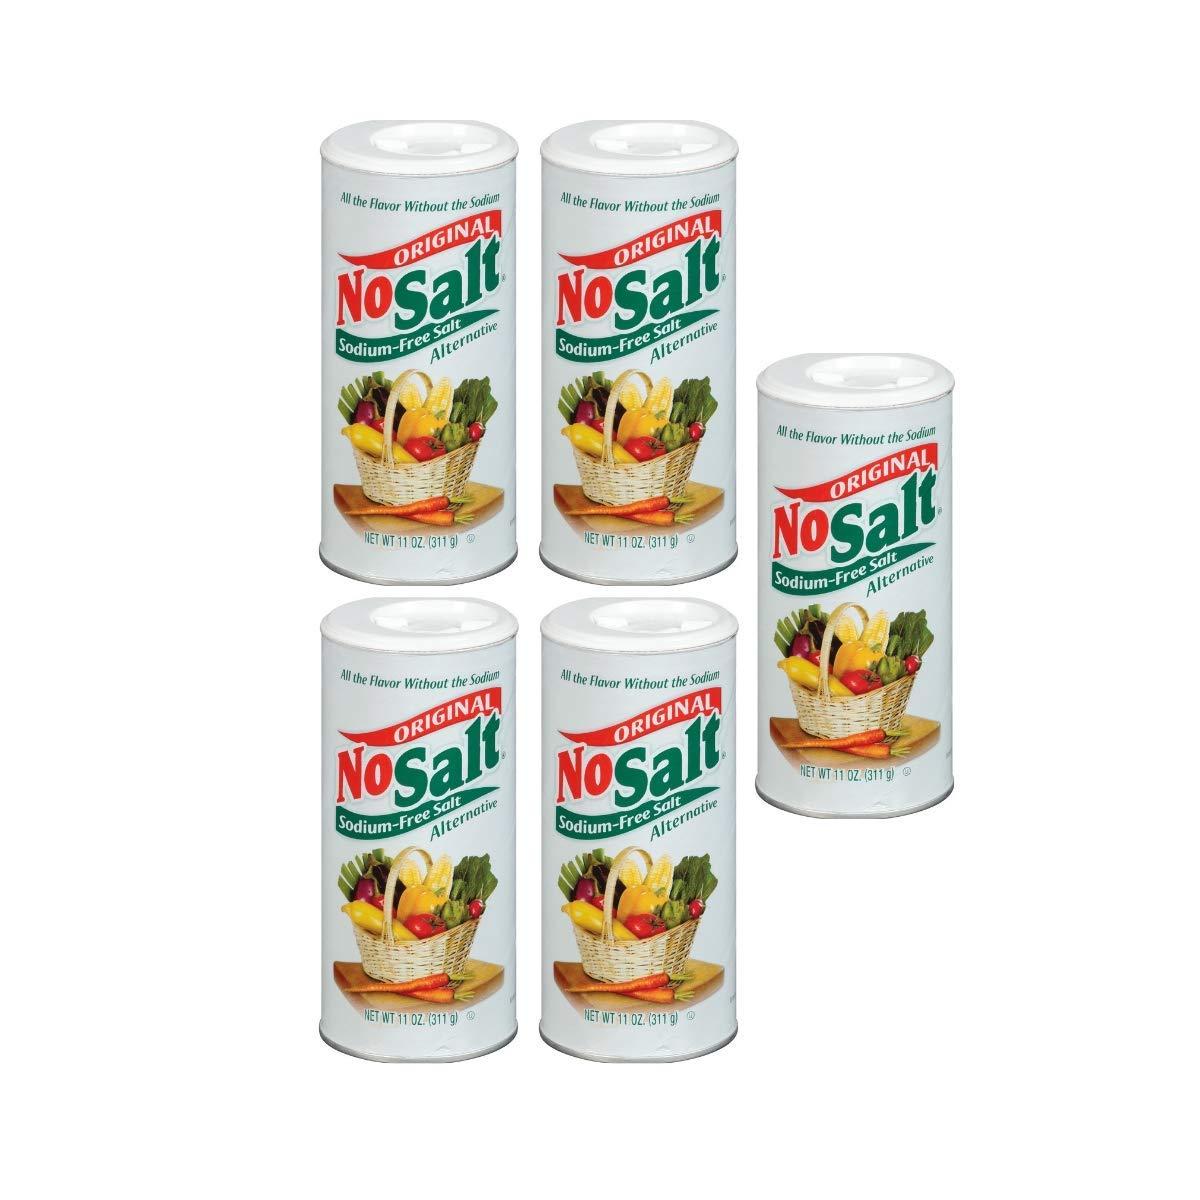 NoSalt Original Sodium-Free Salt Alternative (11oz Canister 5 pack)